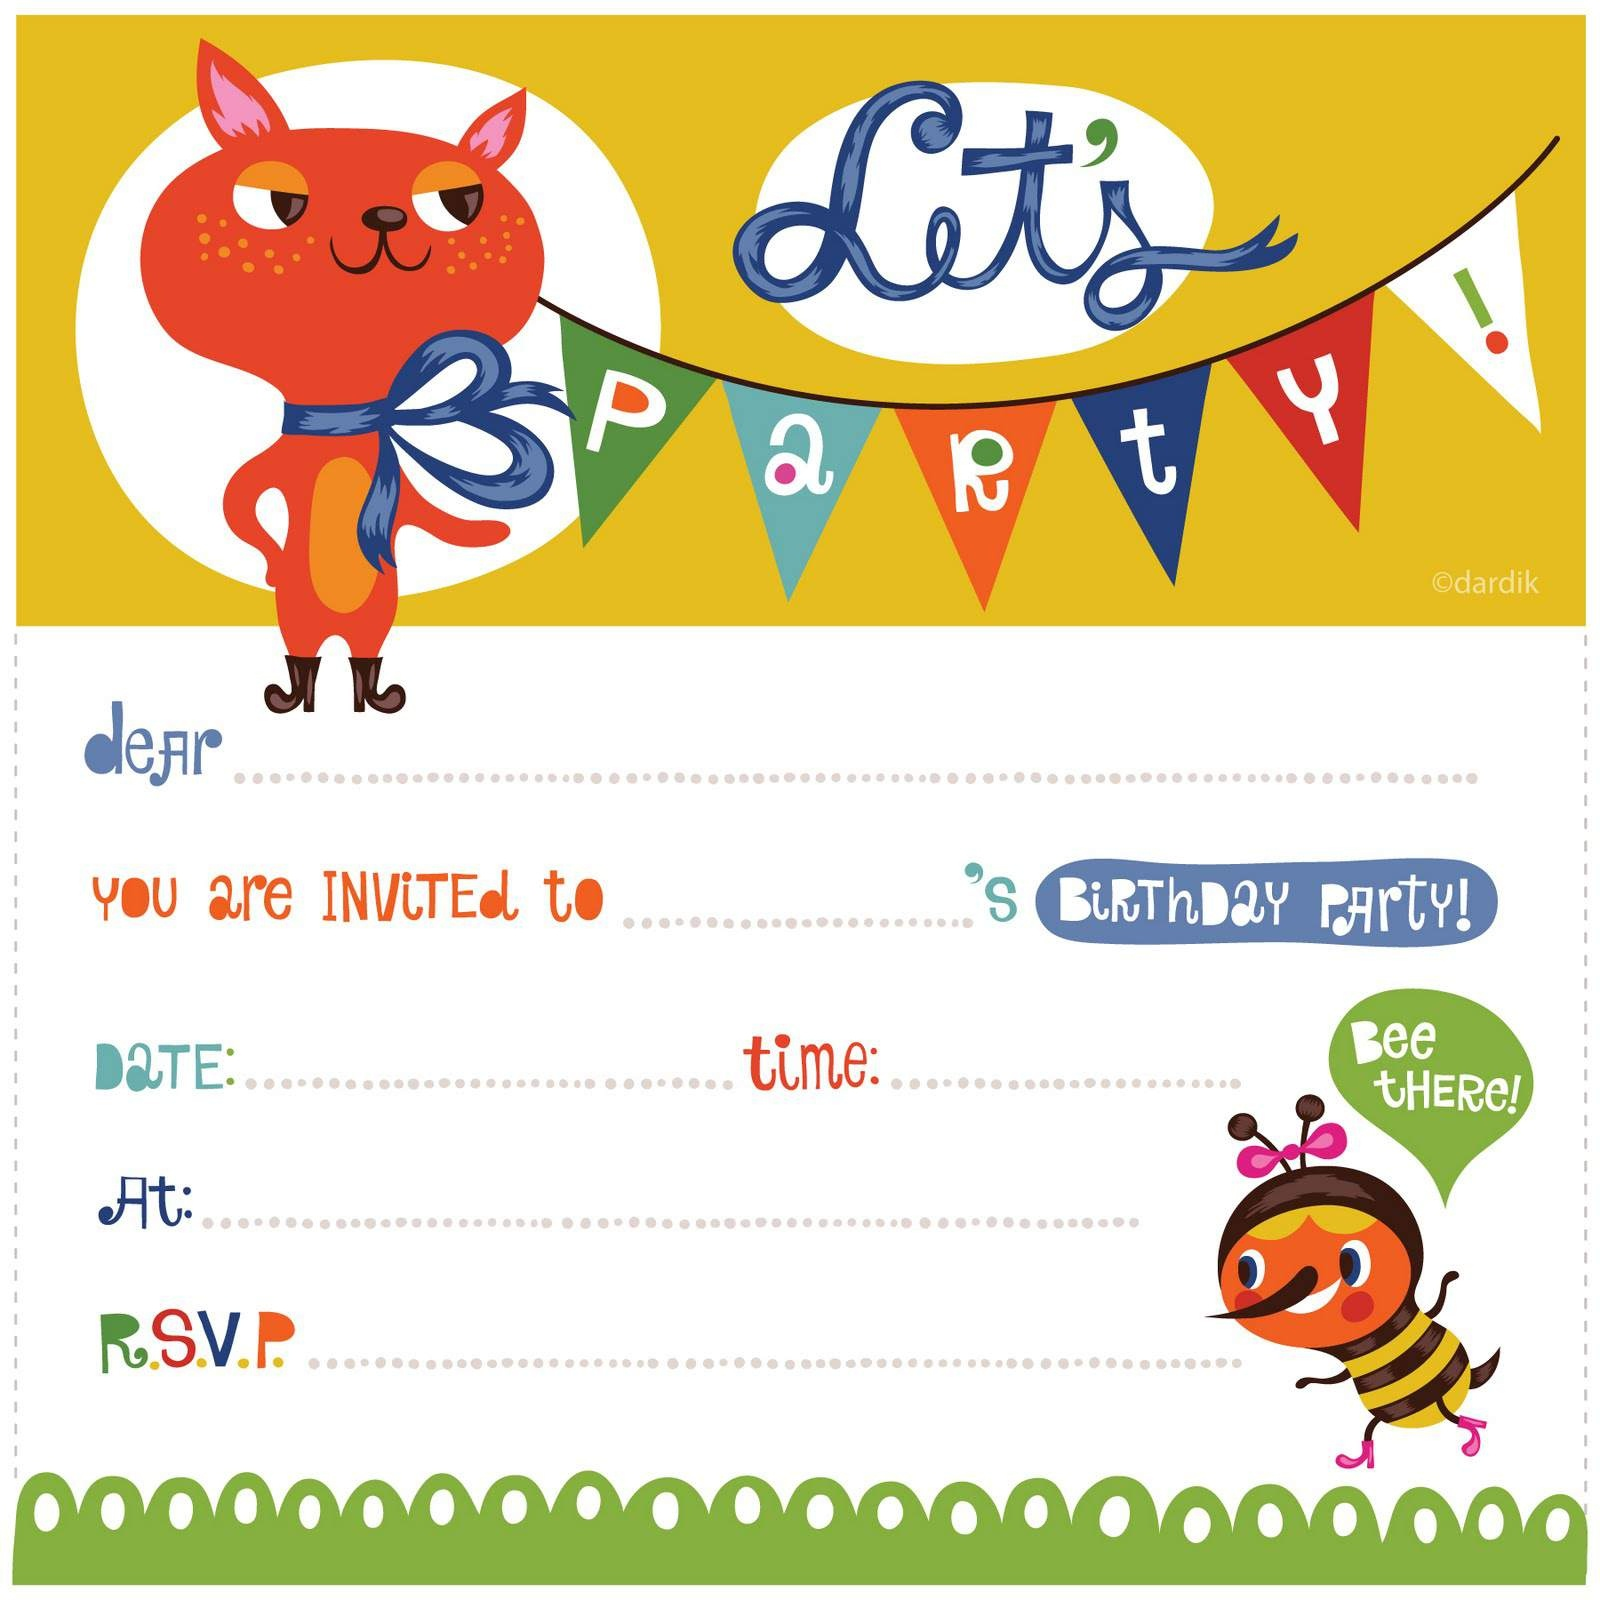 Make Printable Birthday Invitations - Demir.iso-Consulting.co - Make Printable Party Invitations Online Free